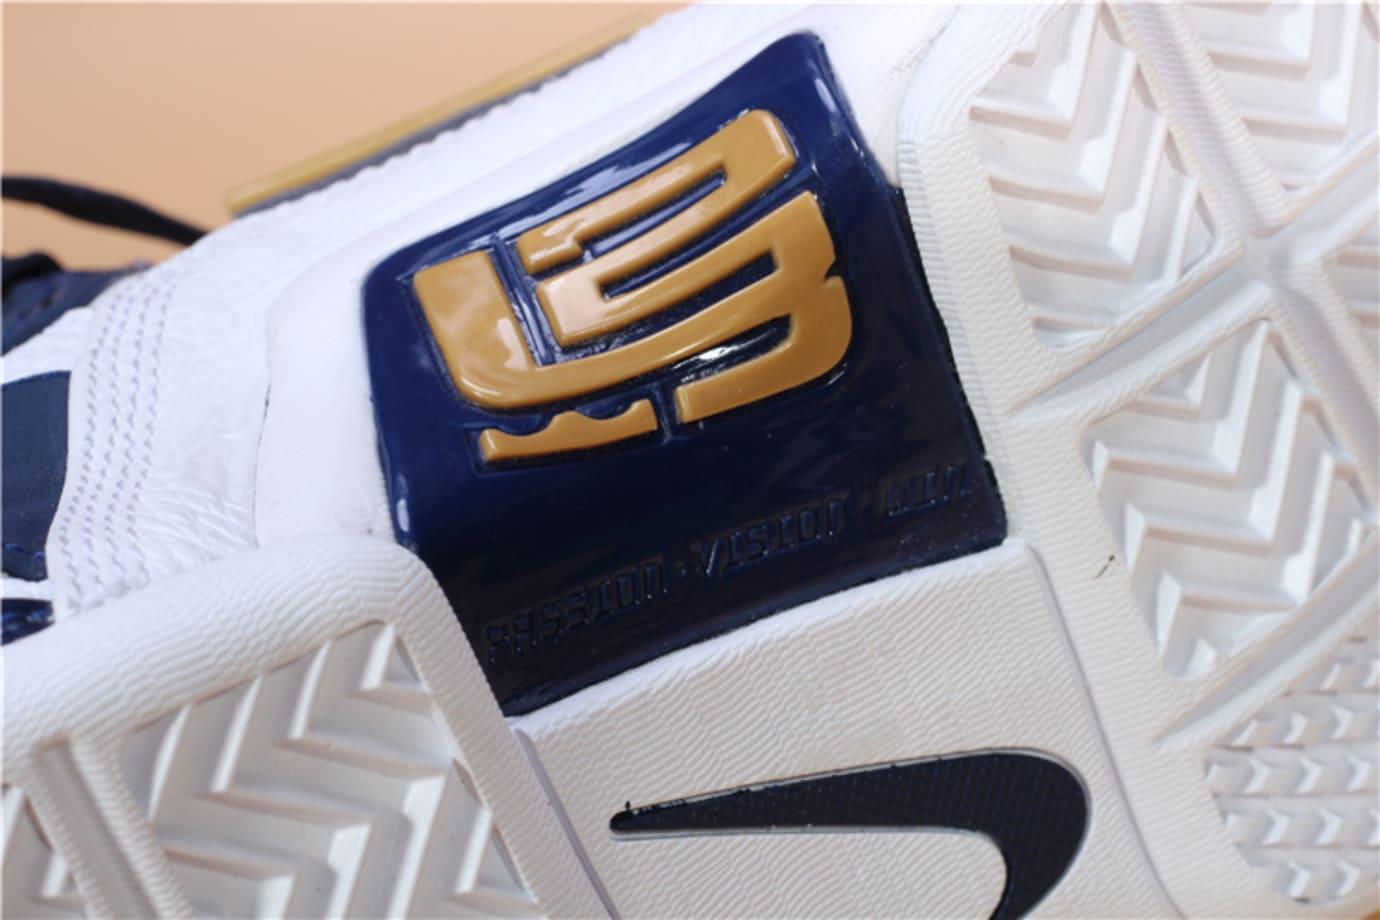 finest selection 02182 62b1e Nike LeBron Soldier 1 Retro 25 Straight Release Date Midsole